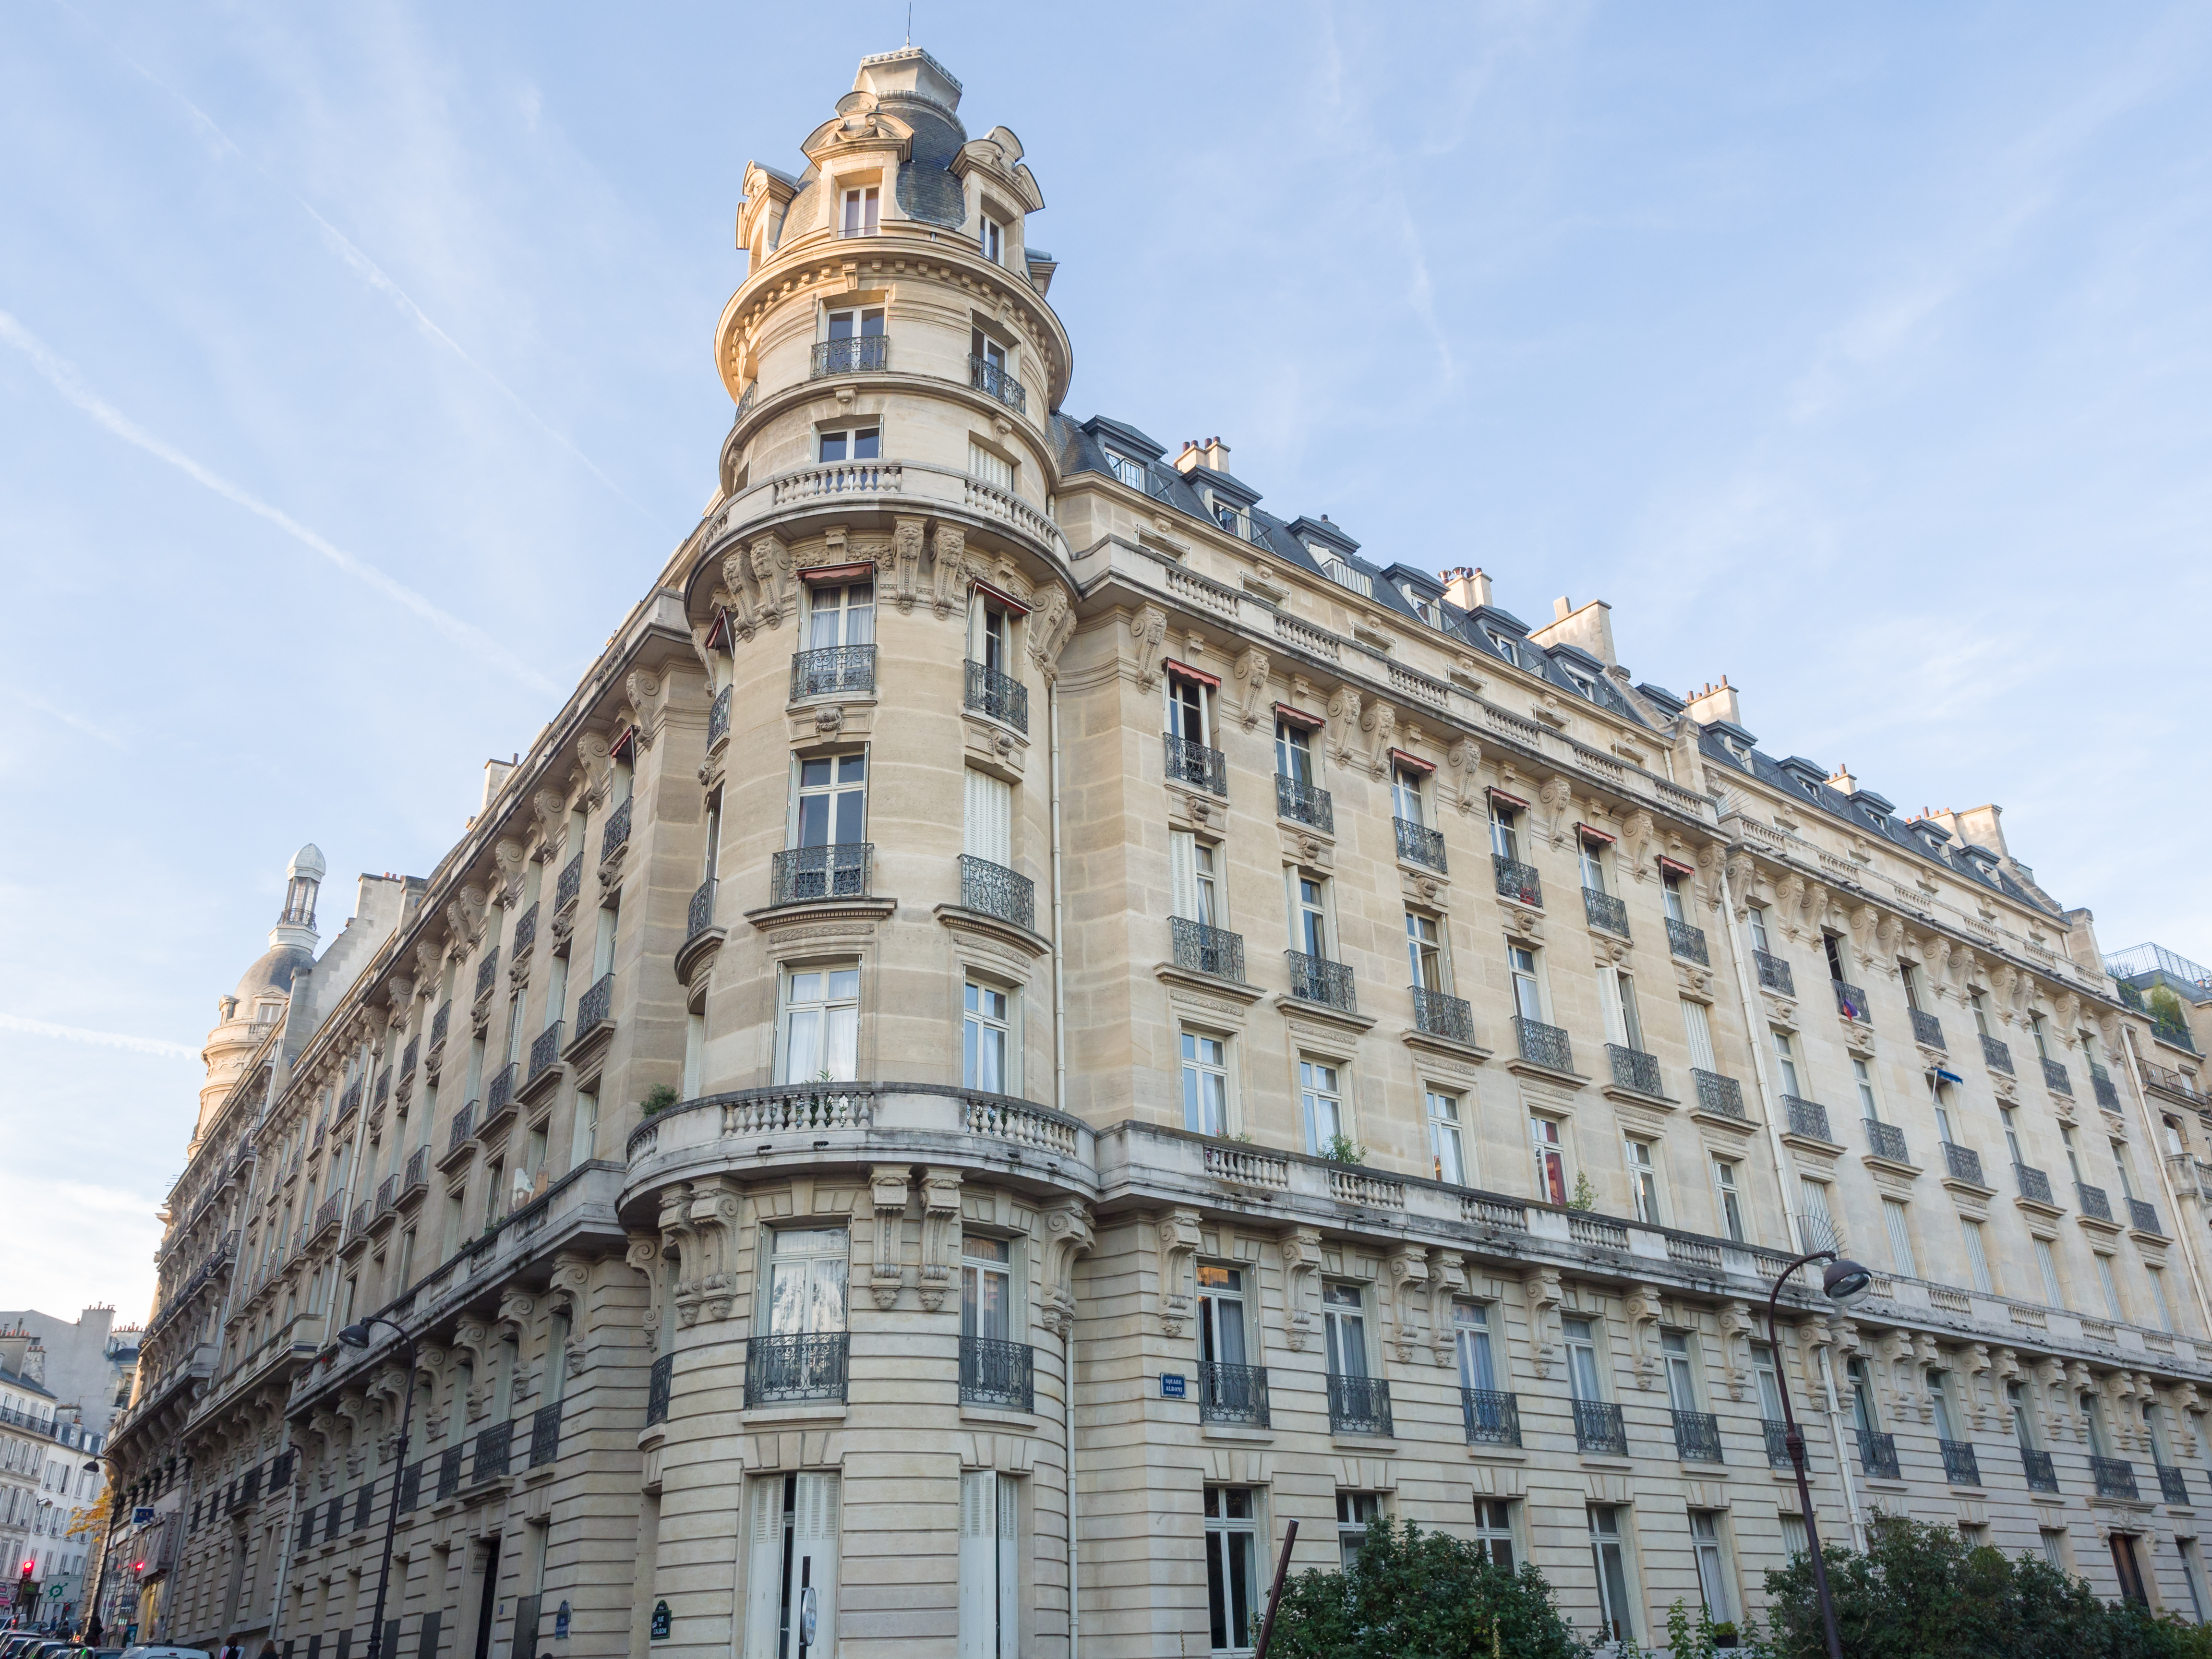 MyFrenchLife™ – MyFrenchLife.org - Baudelaire - Paris - Les fleurs du mal - flaneur - building